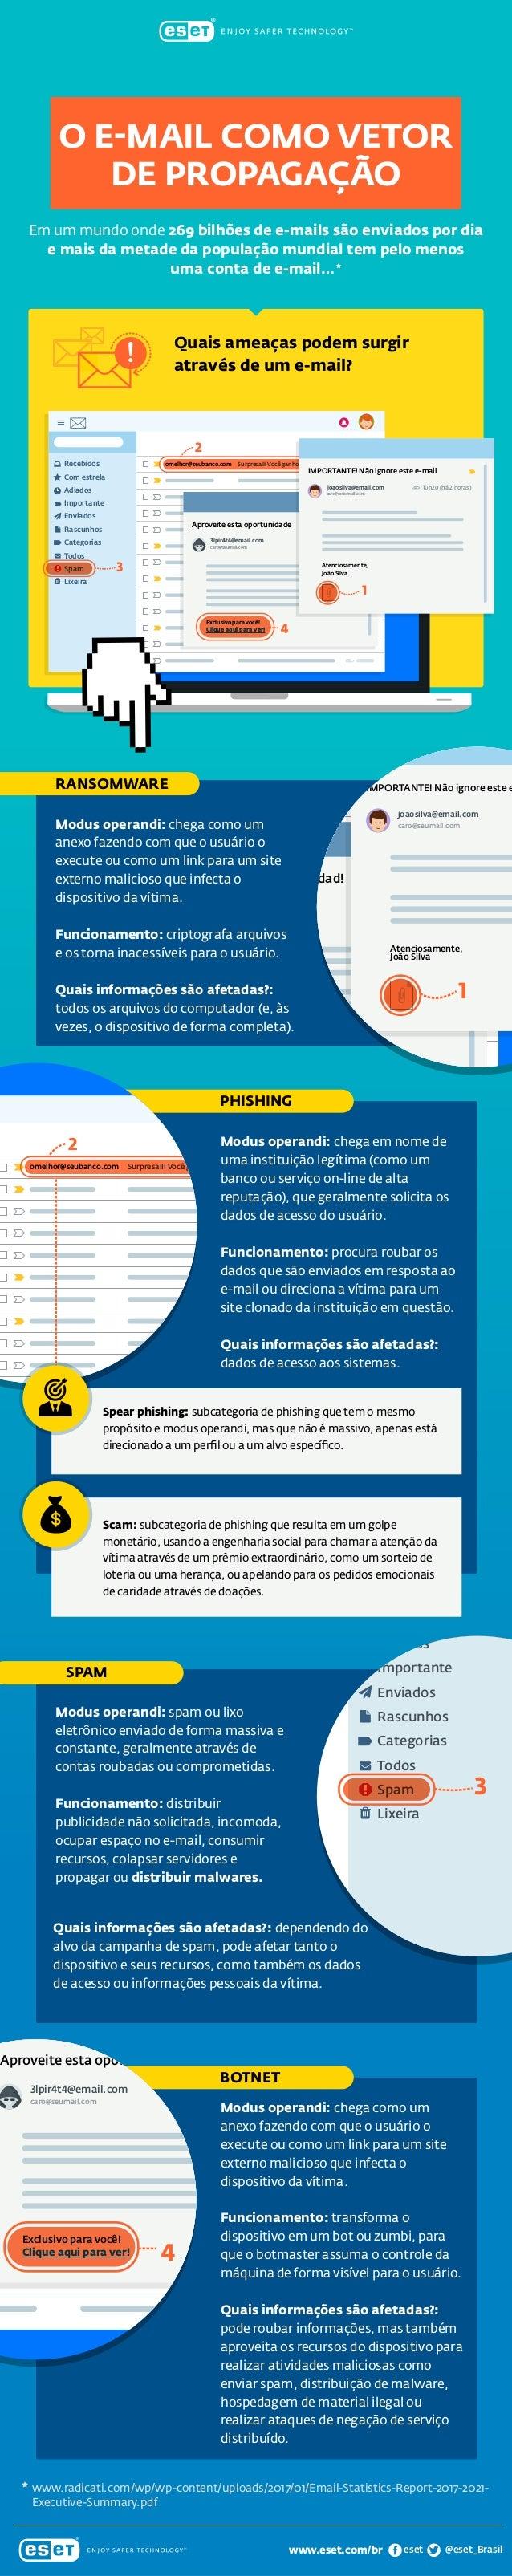 Recibidos Destacados Adiados Importante Enviados Rascunhos Categorias Todos Spam Lixeira 3 omelhor@seubanco.com Surpresa!!...